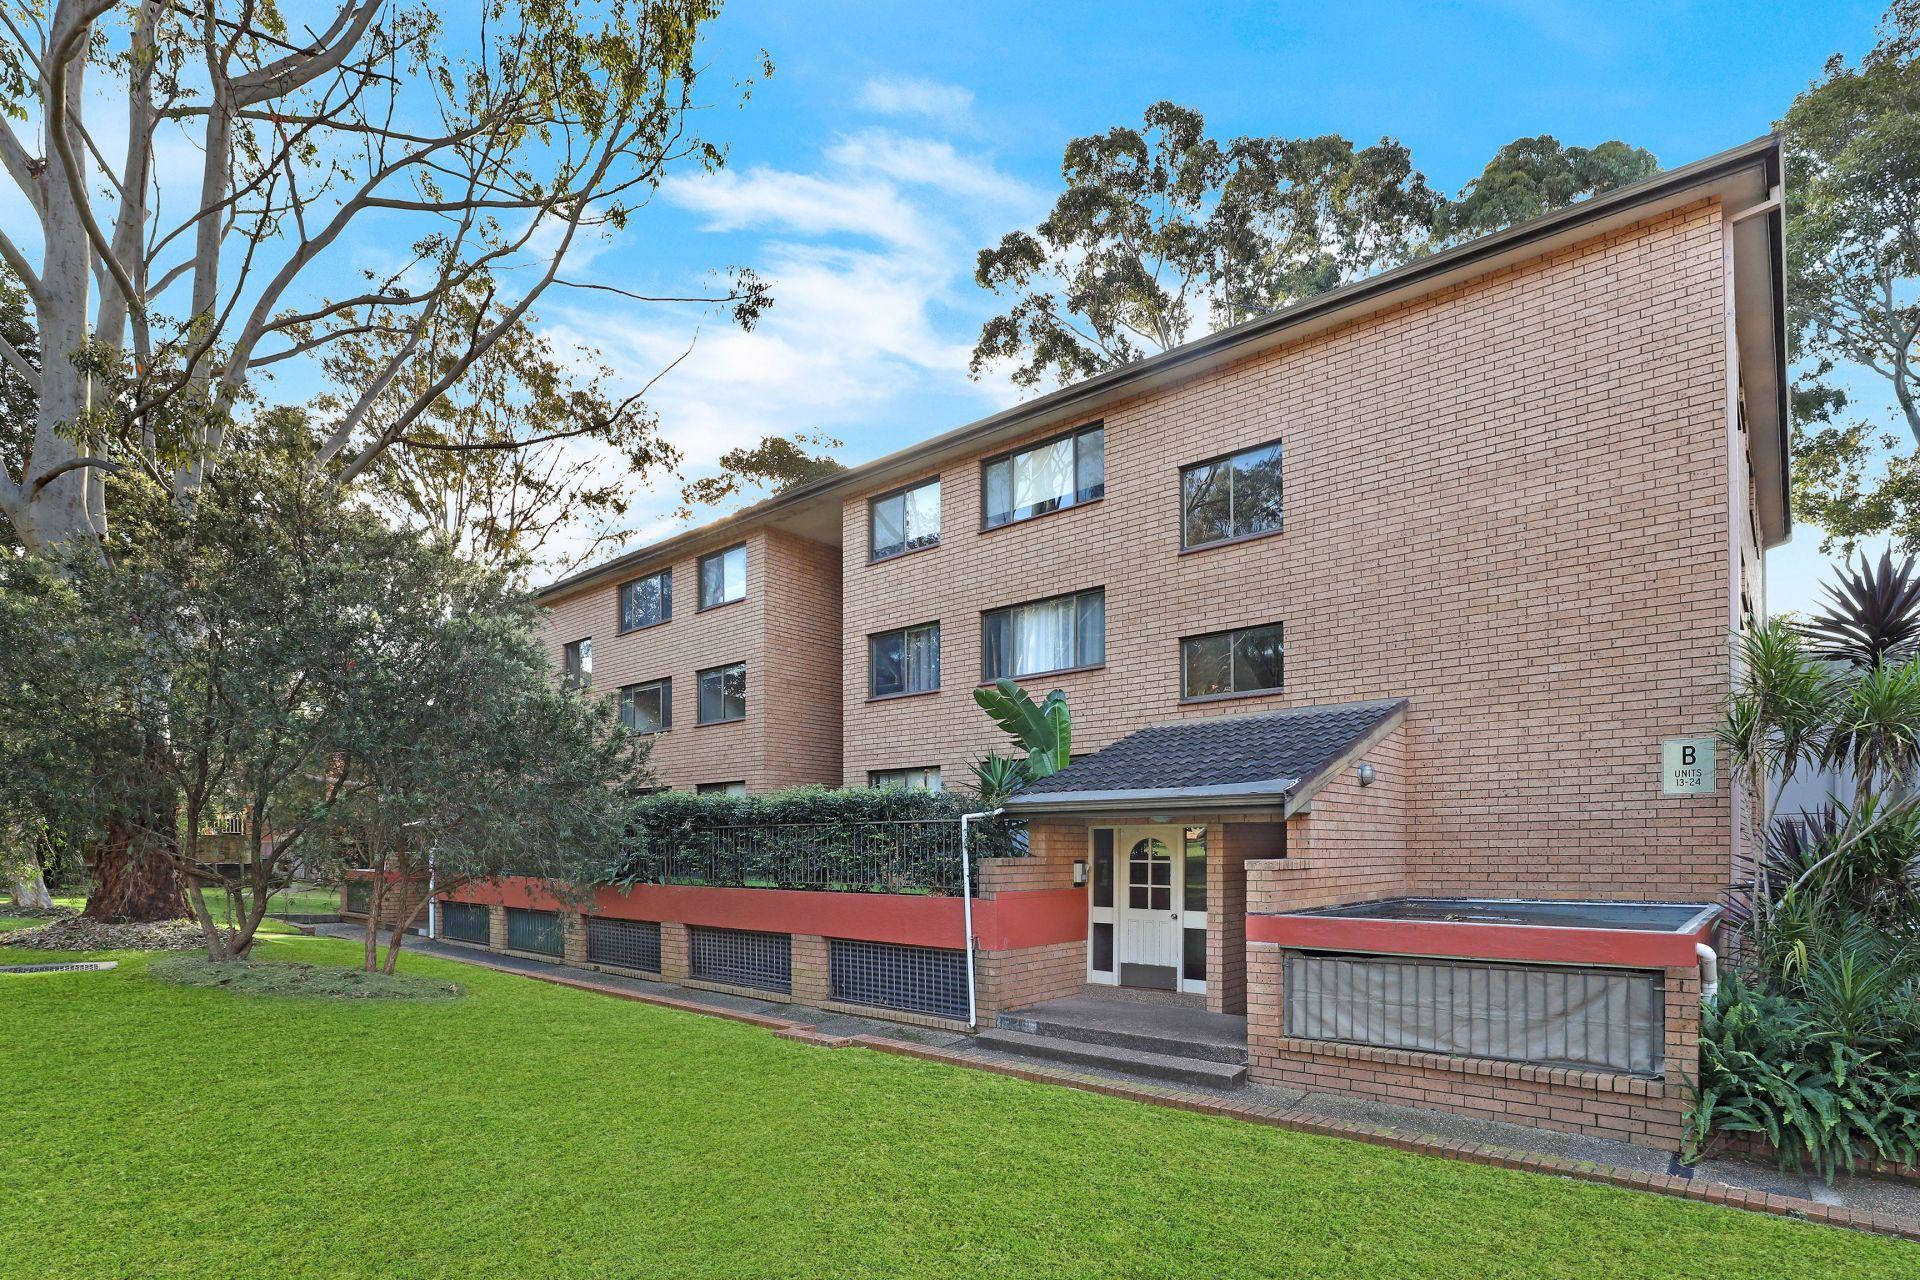 24/87-89 Flora Street, Sutherland NSW 2232